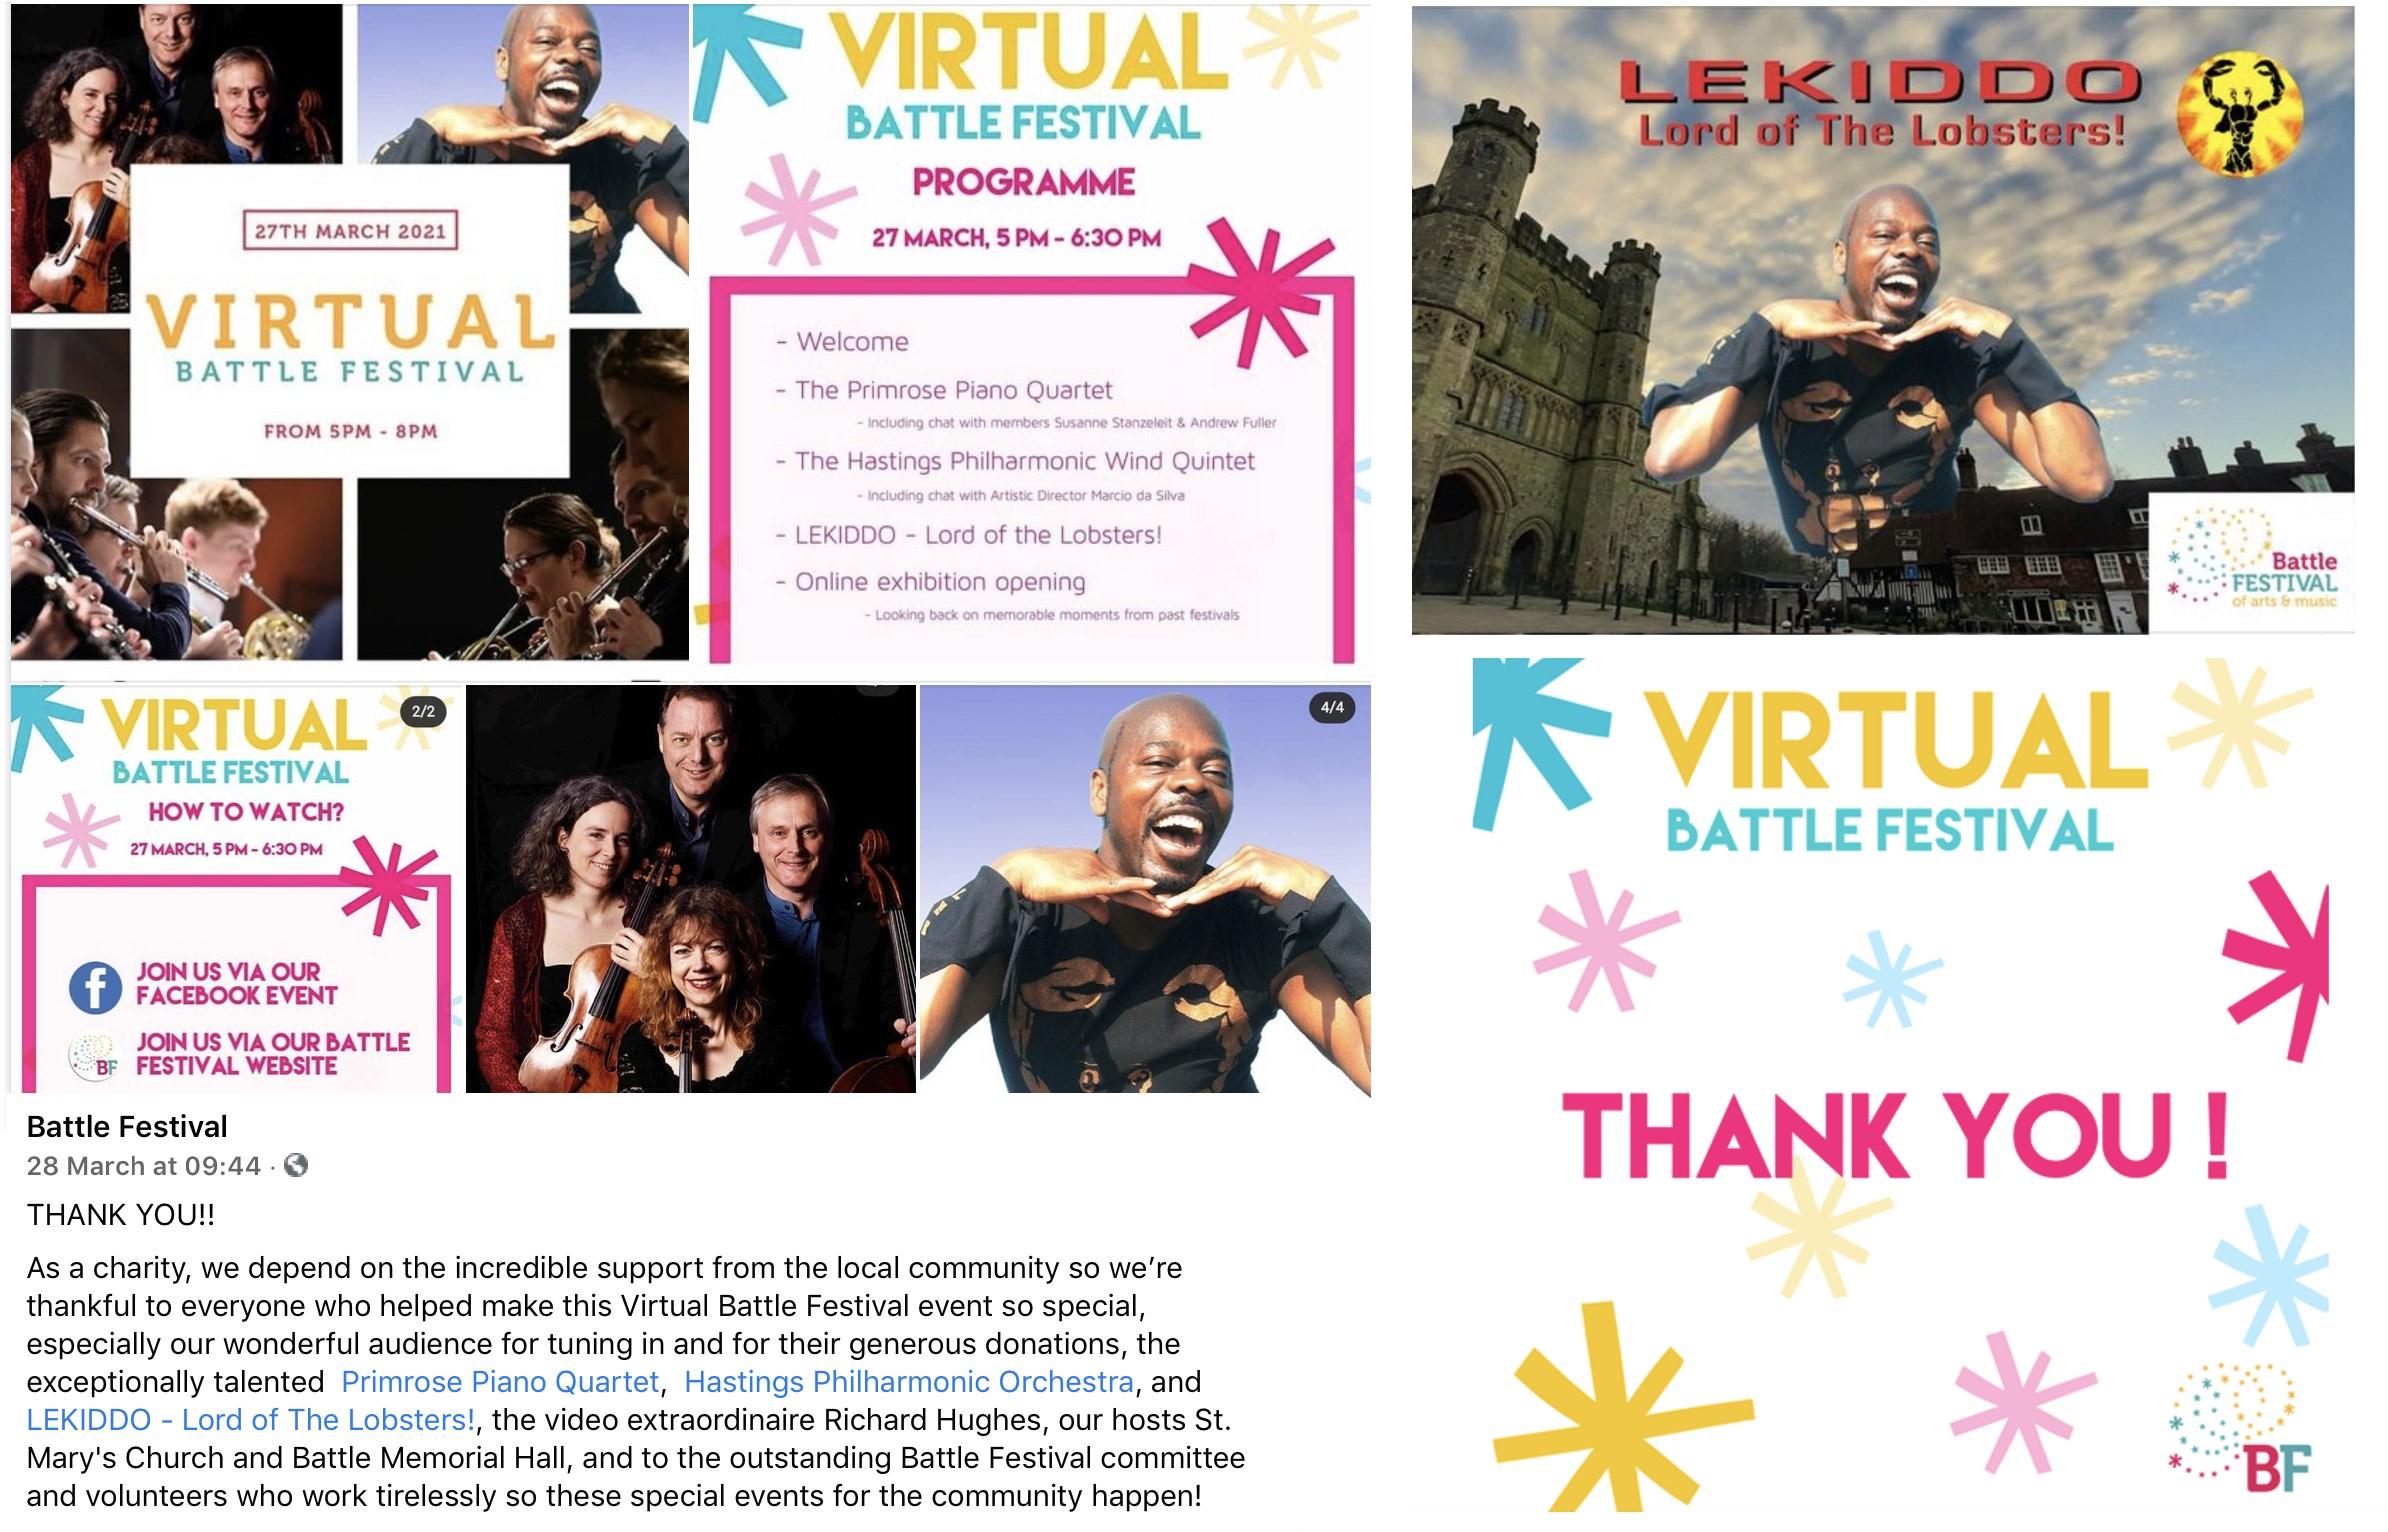 LEKIDDO - Lord of The Lobsters! is Headline Artist at Virtual Battle Festival, 27 March 2021